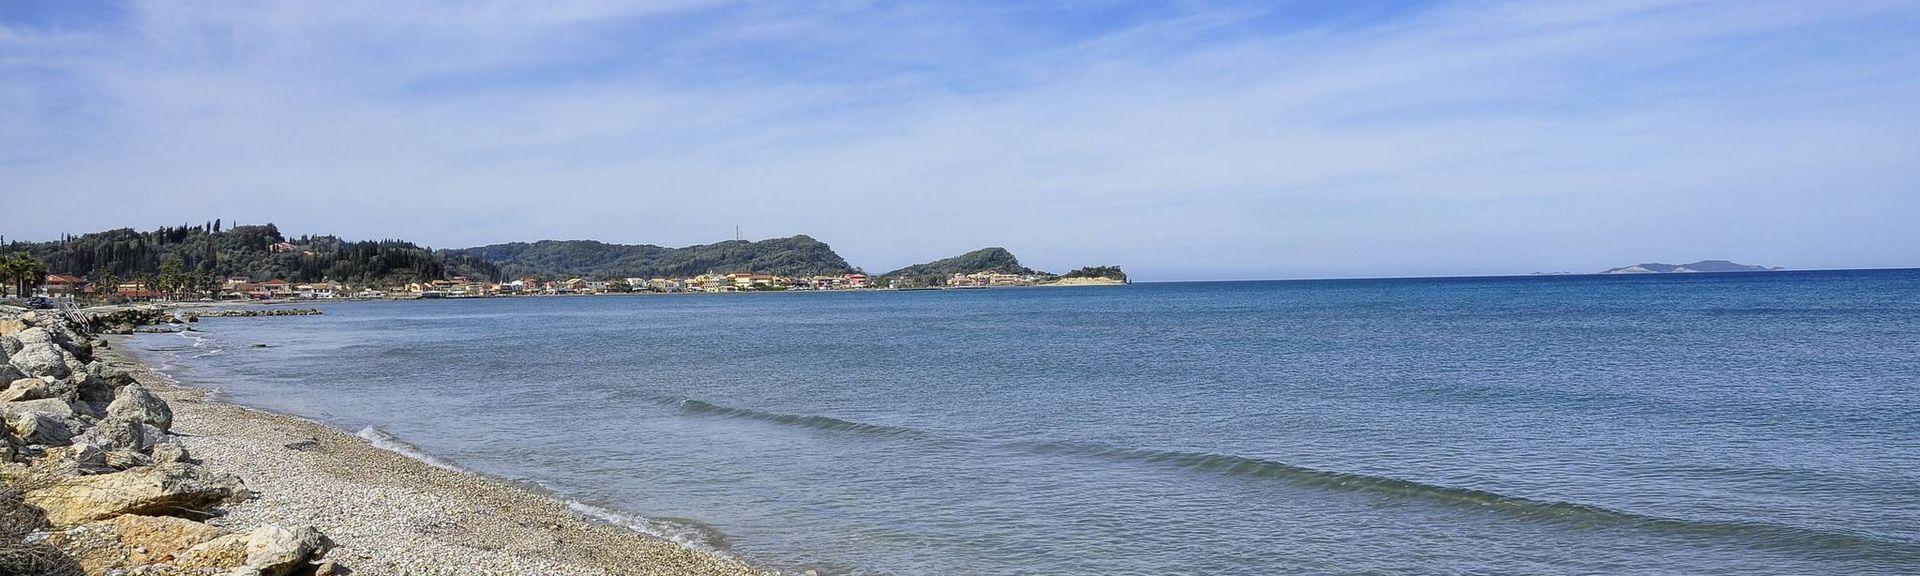 Feakes, Πελοπόννησος, Ελλάδα